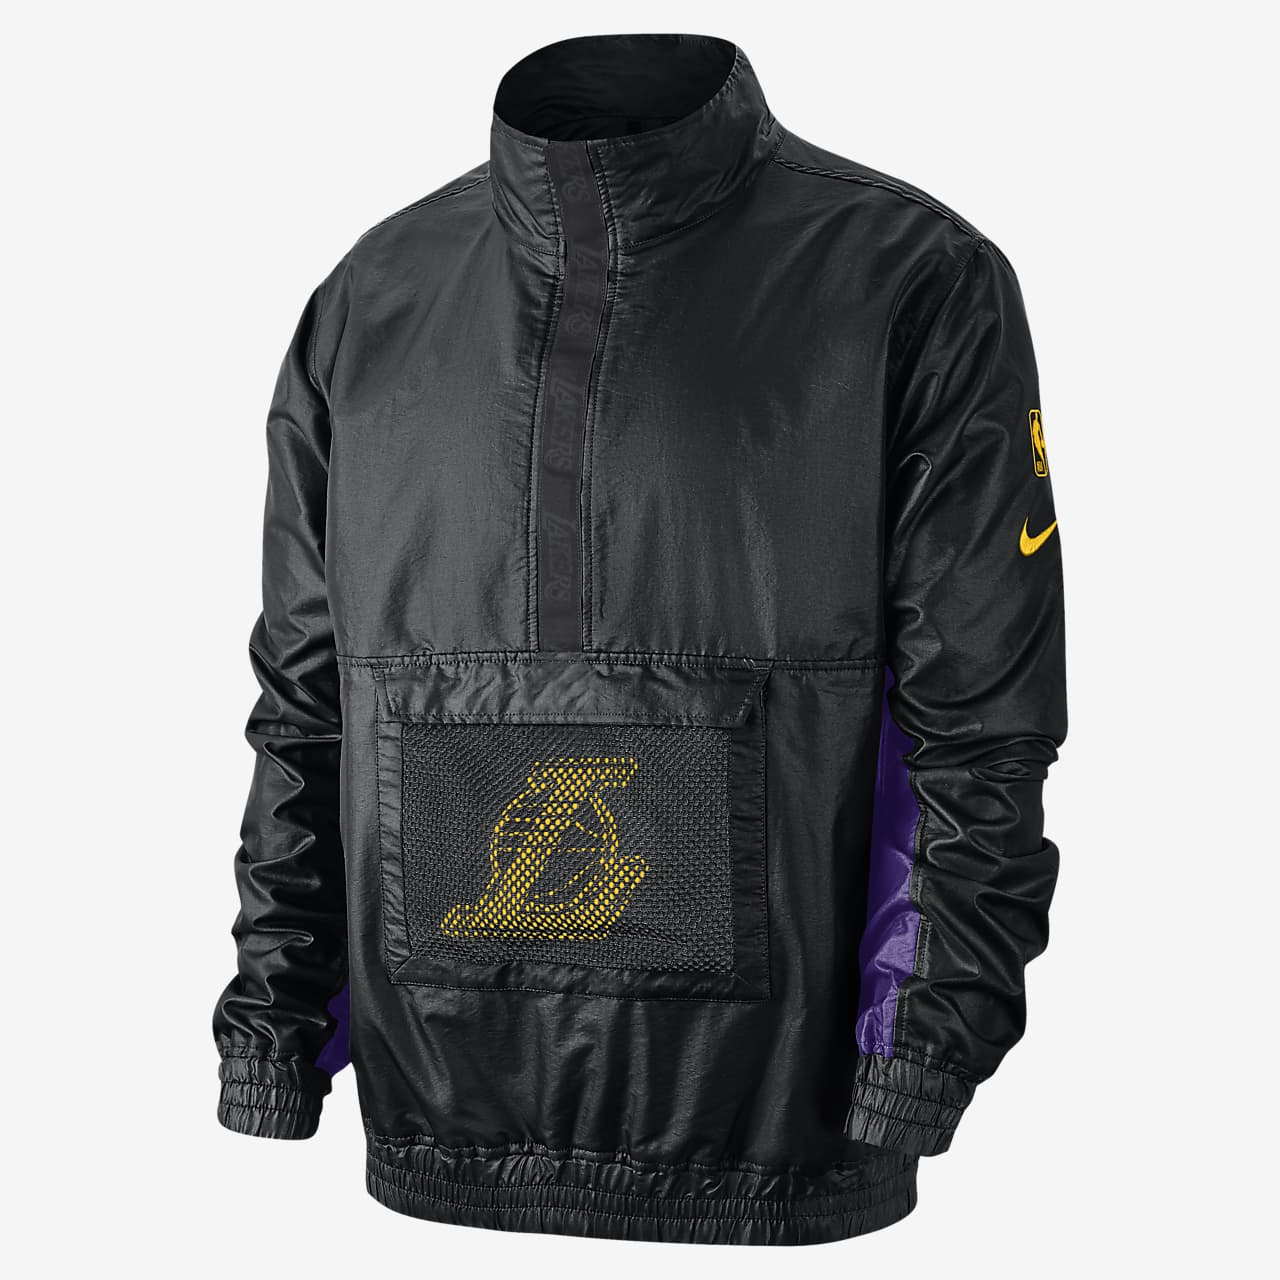 Los Angeles Lakers Nike Men's Lightweight NBA Jacket